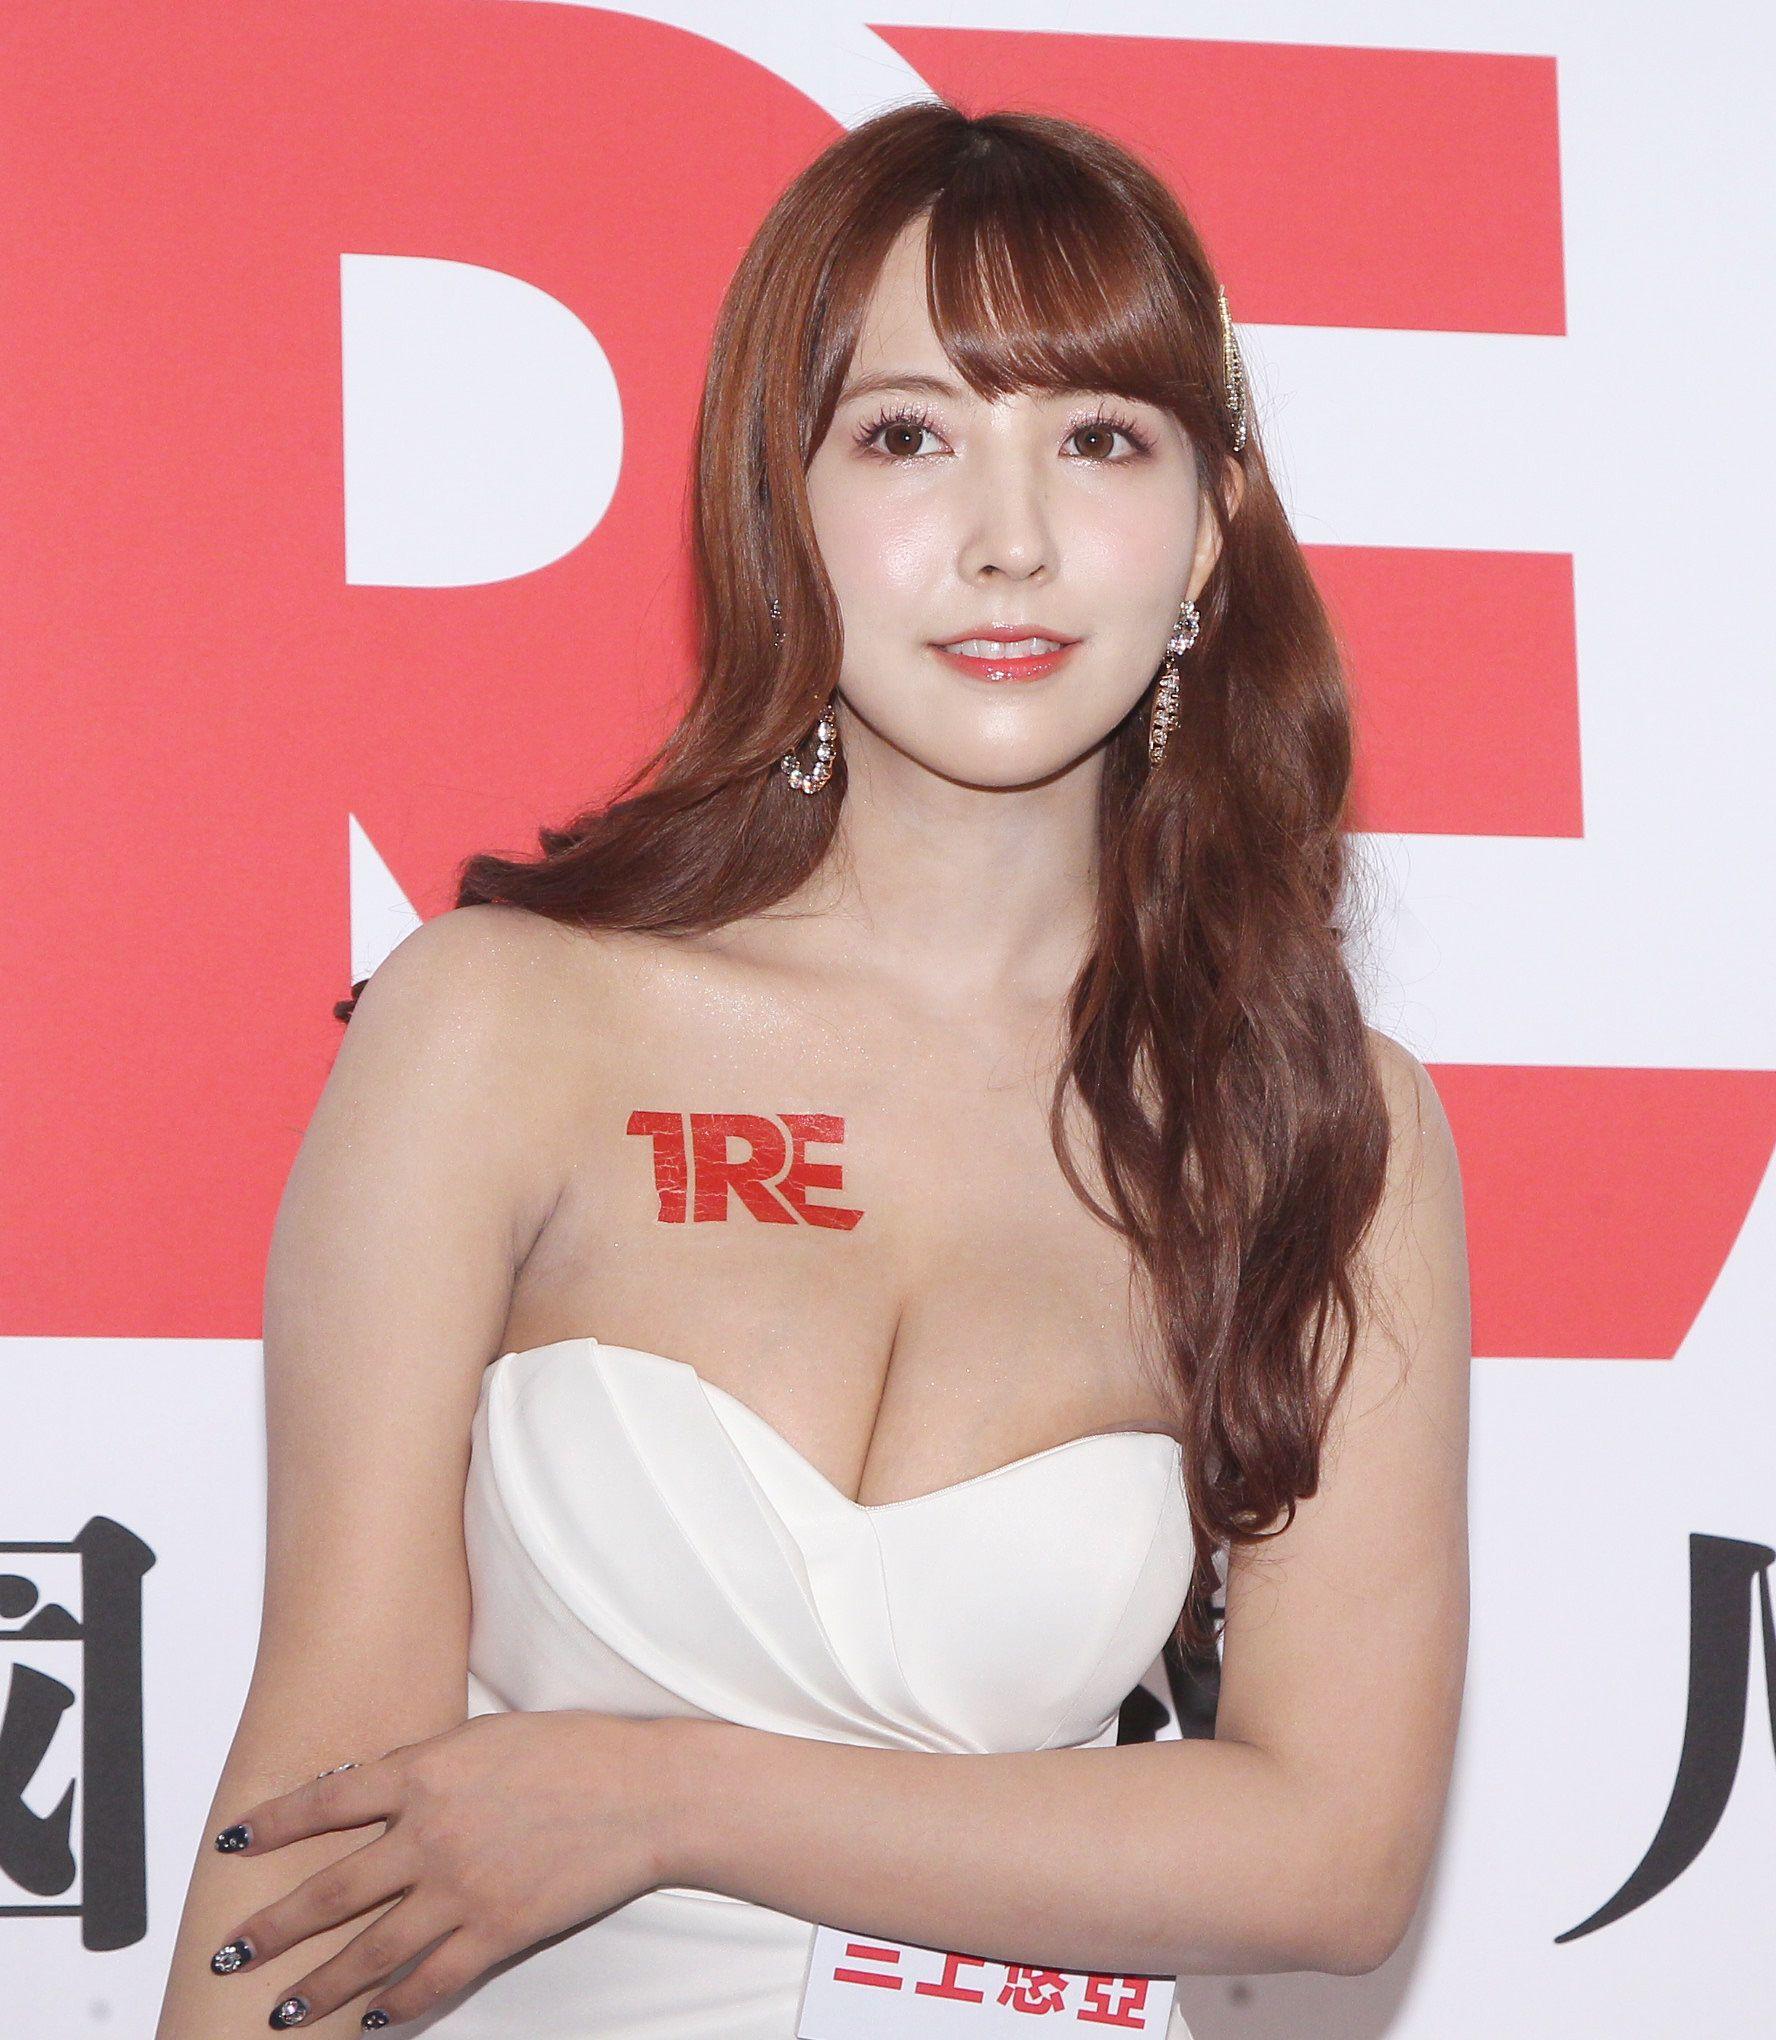 AV女優三上悠亞為2019「TRE台北國際成人展」設計專屬愛心手勢。(記者邱榮吉/攝影)